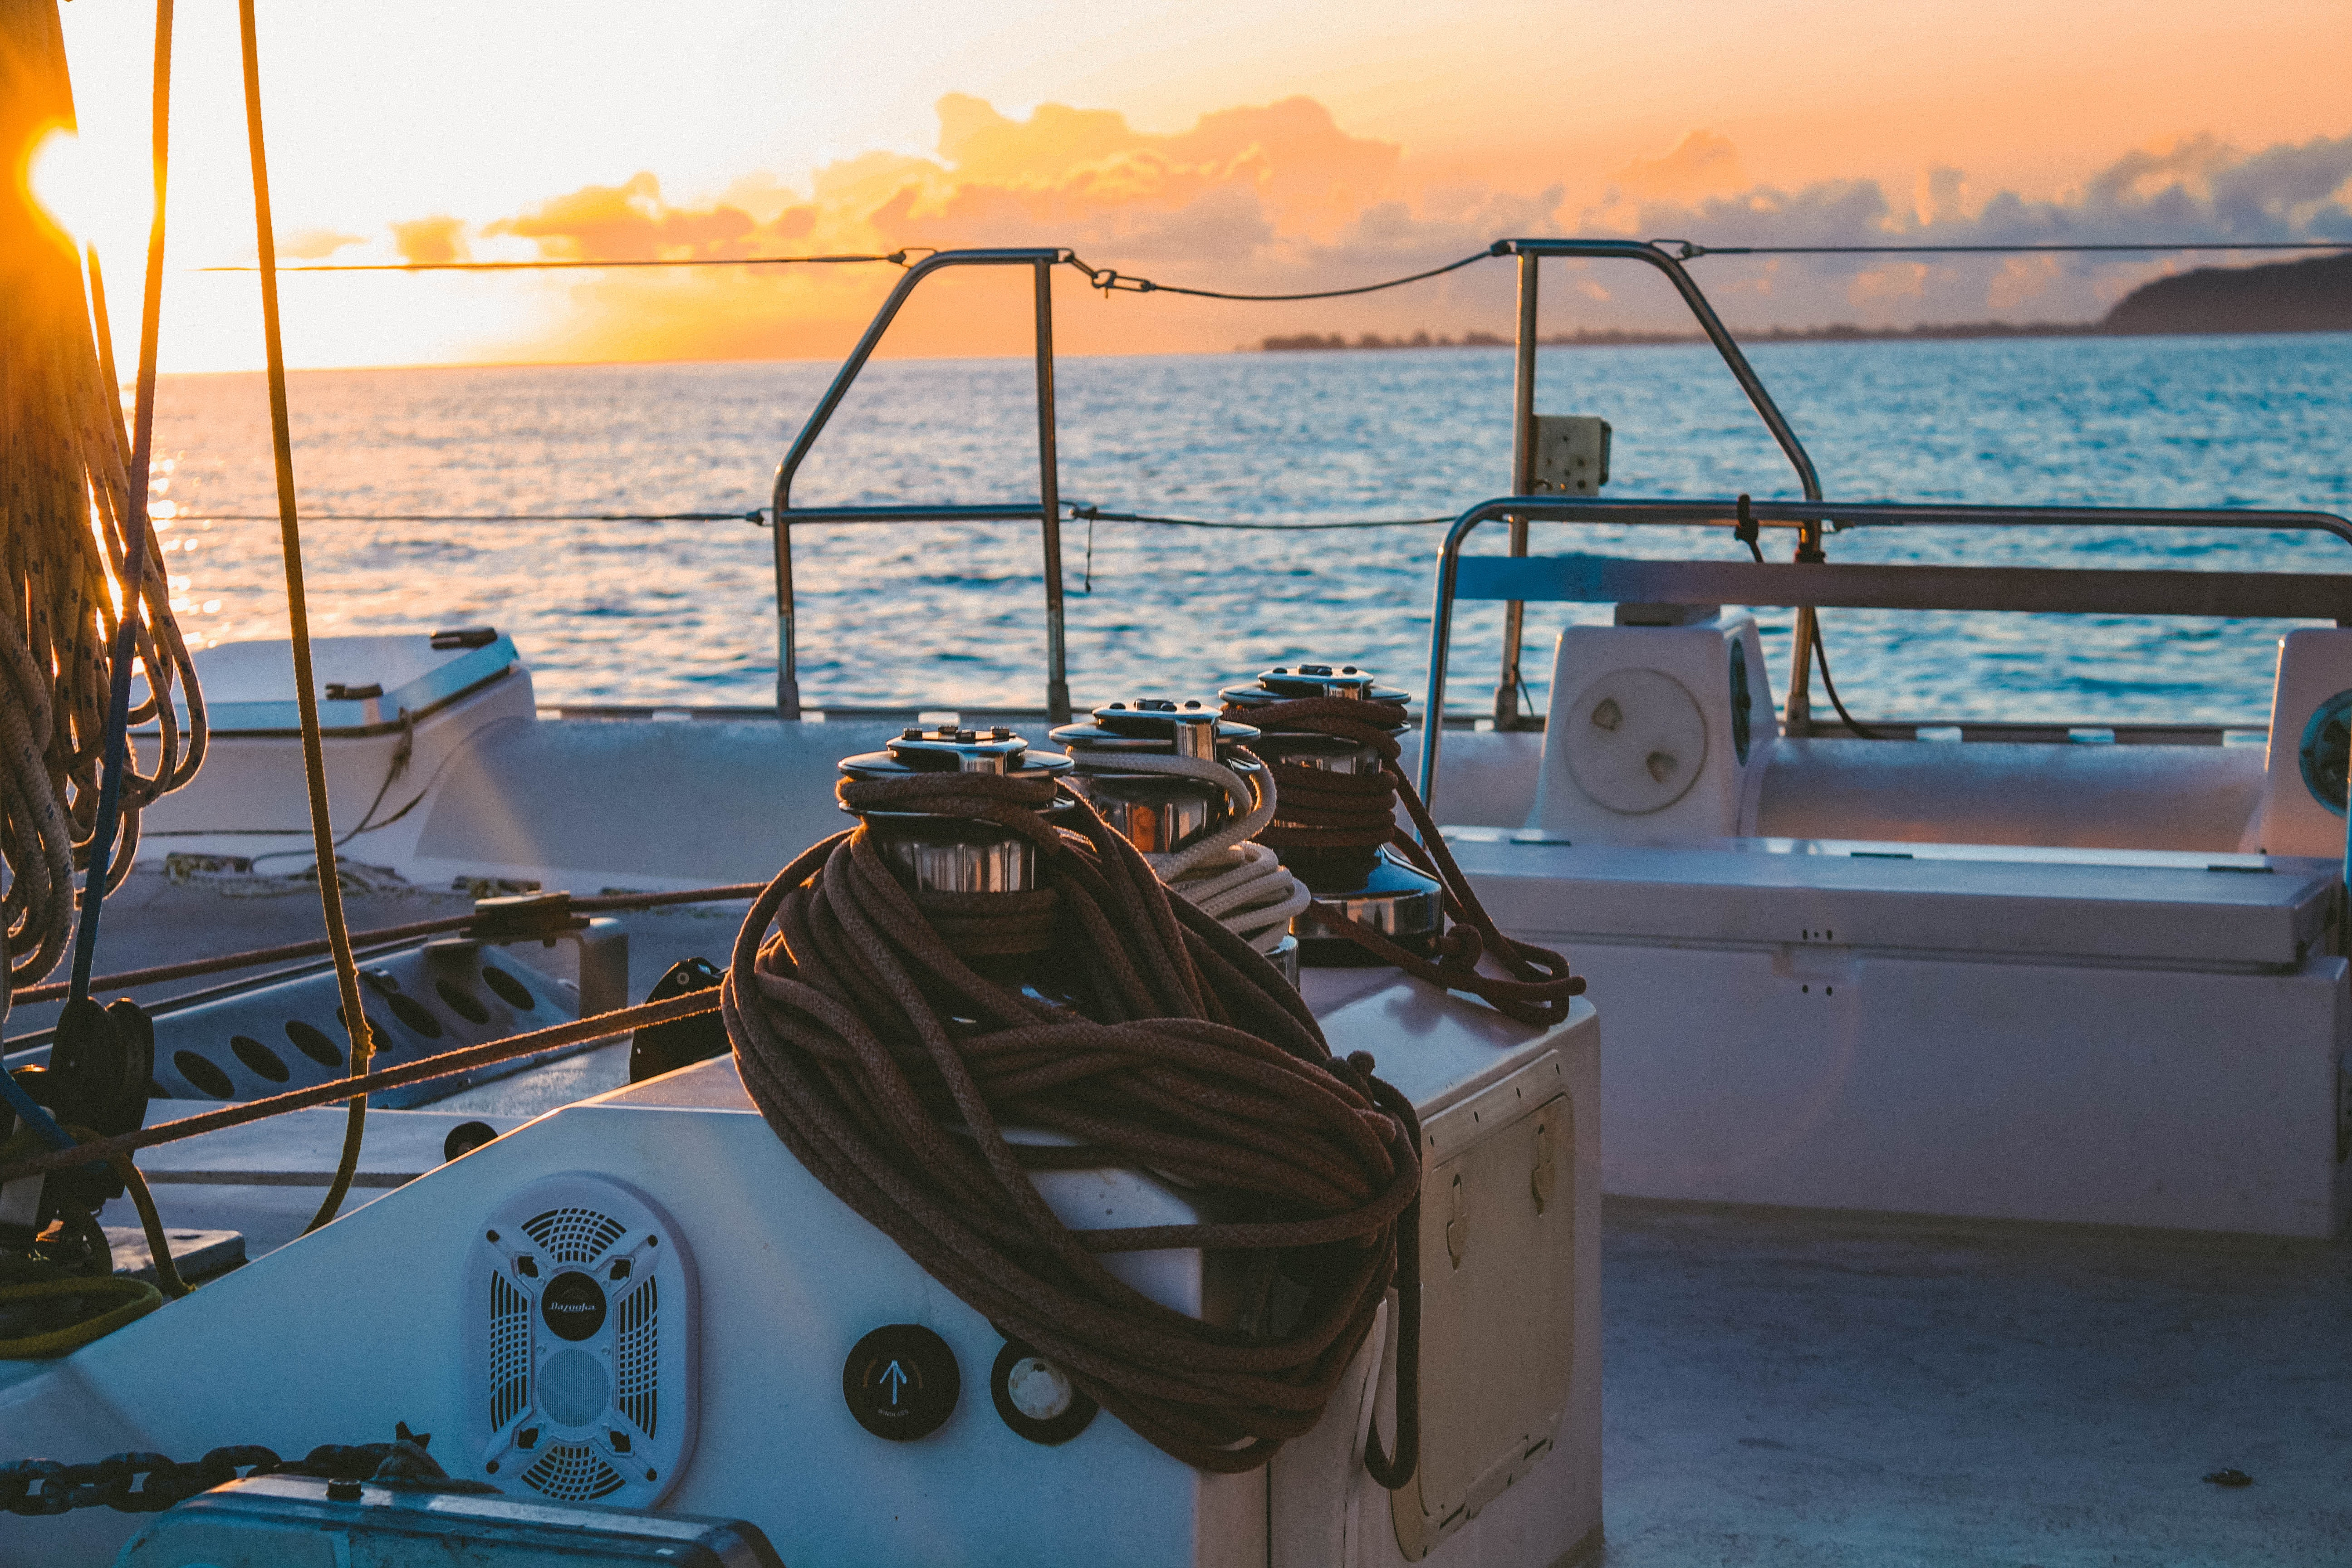 boat-cruise-deck-1167023.jpg